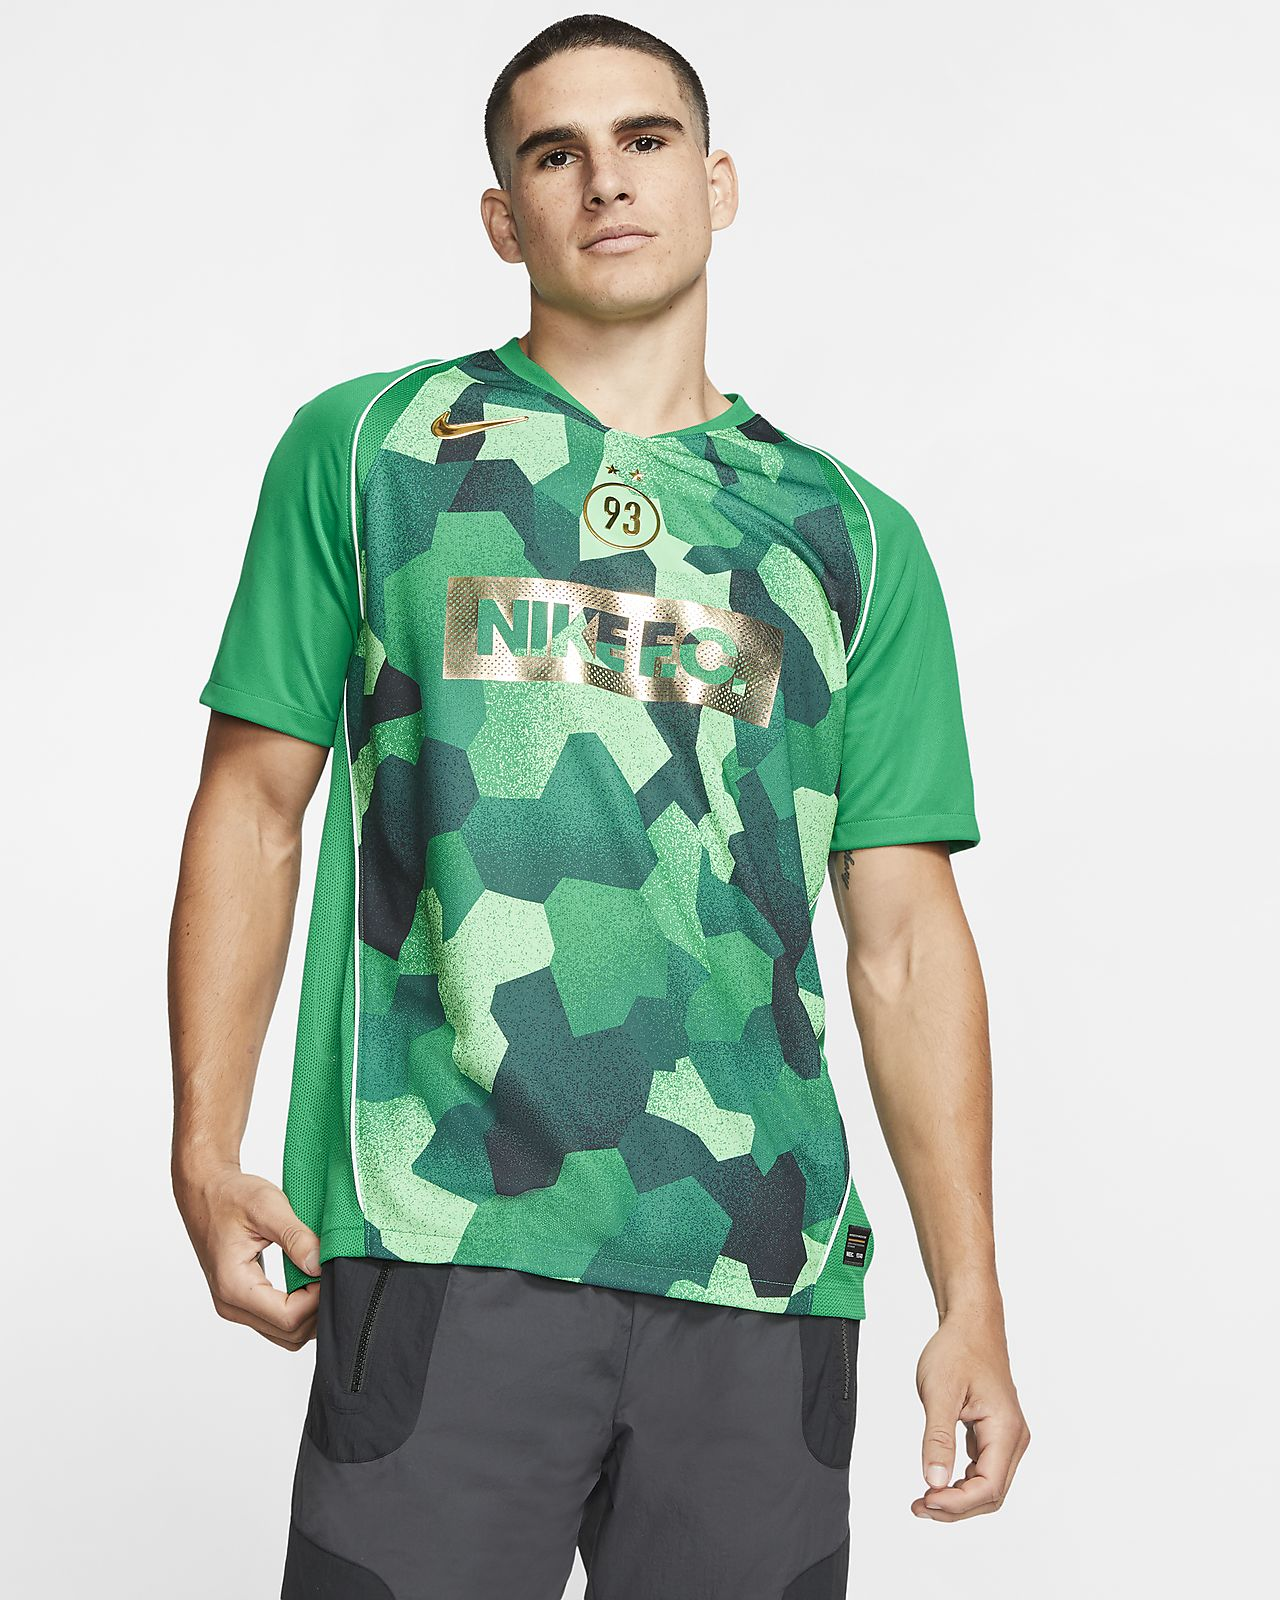 maillot nike football maroc